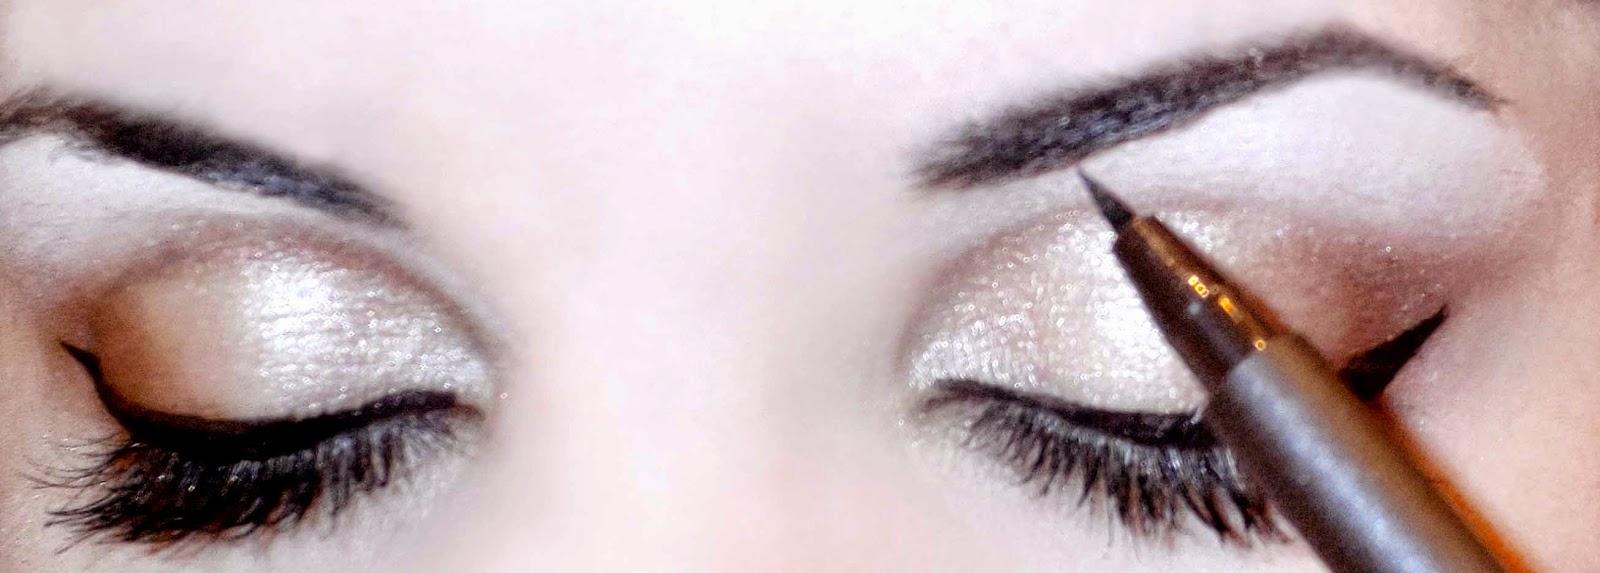 maquillaje pin up cejas angulosas